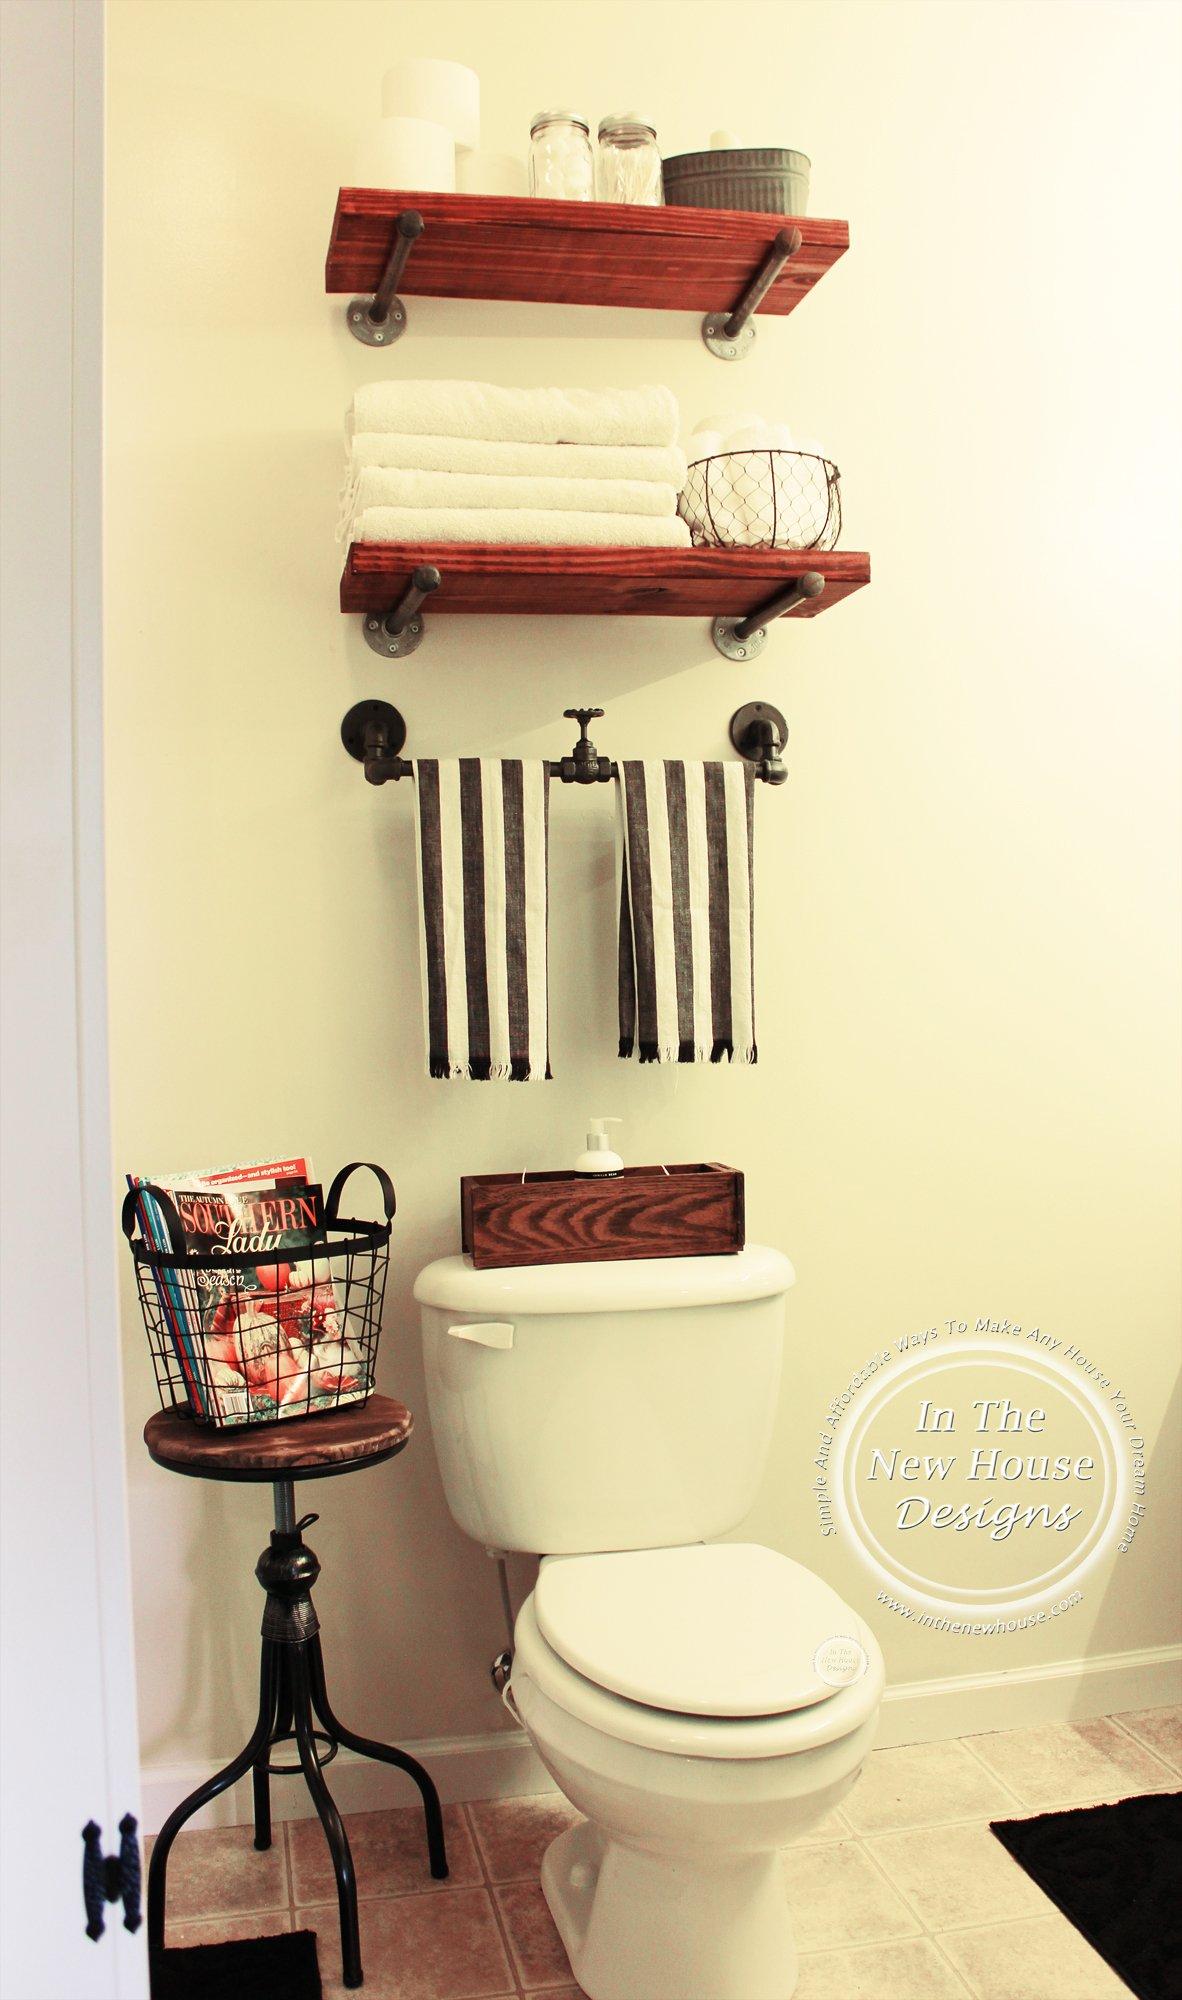 Industrial Farmhouse Bathroom Reveal - In The New House